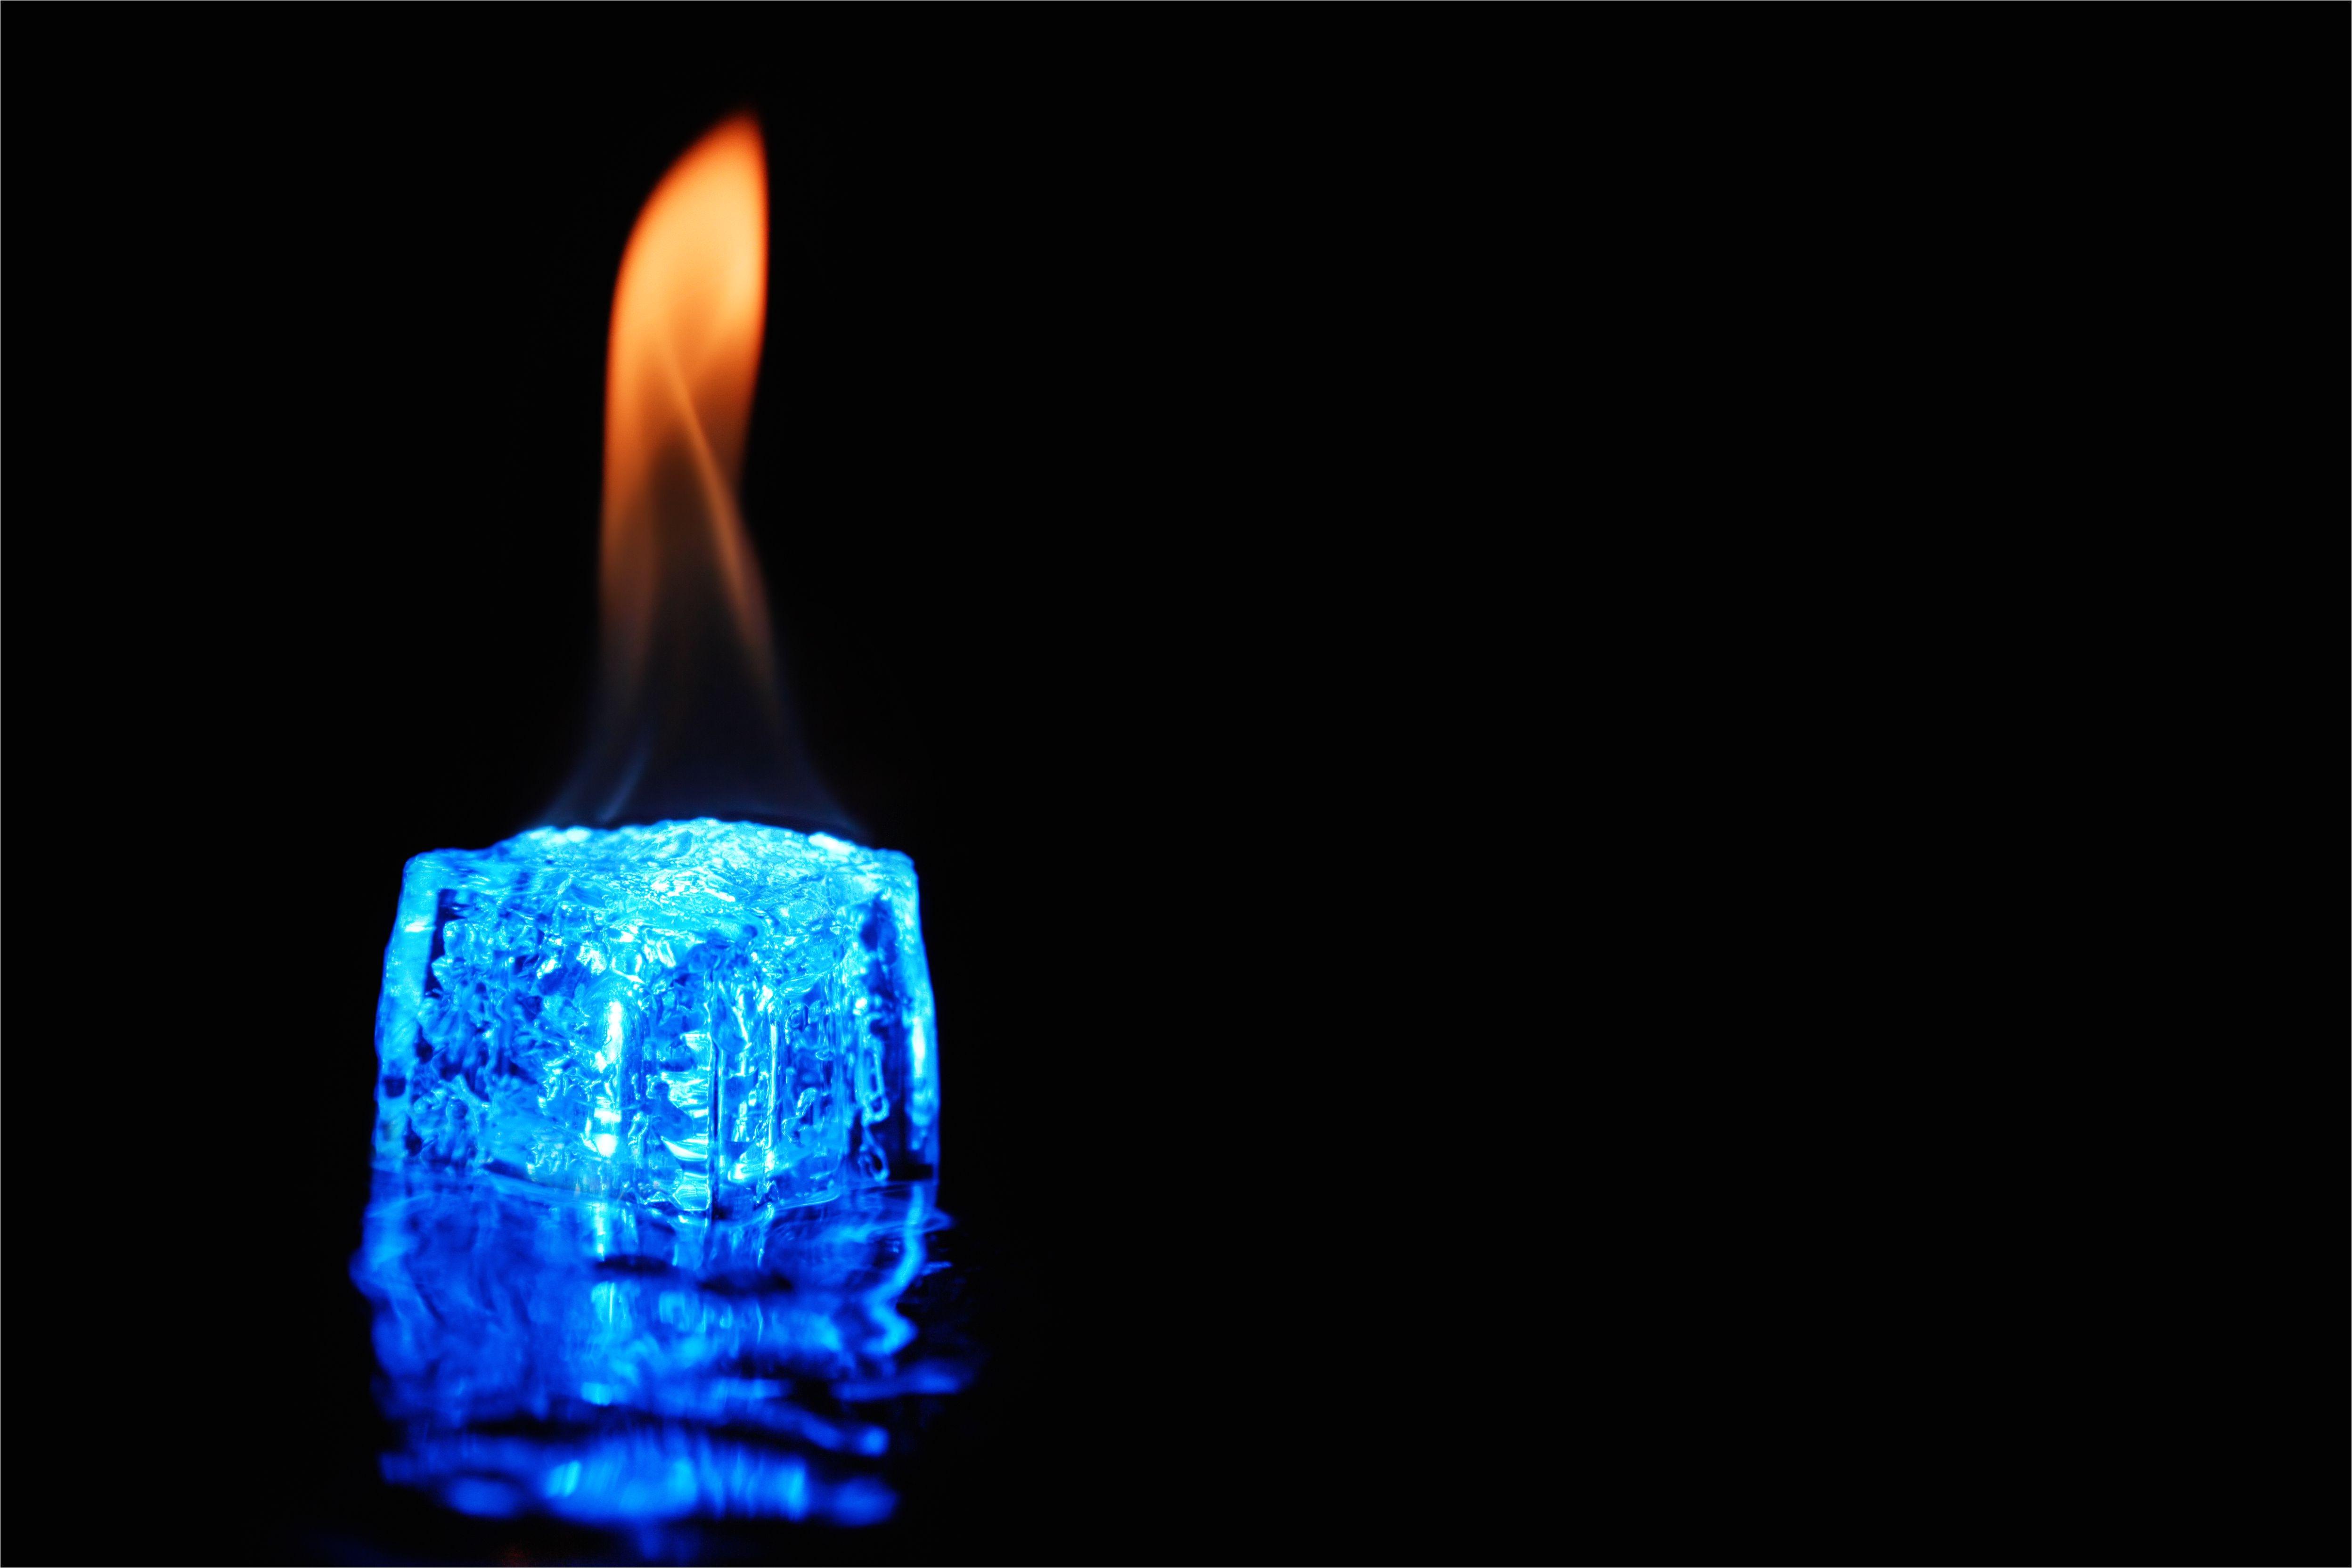 fire and ice 157190004 573889c45f9b58723d561ed8 jpg